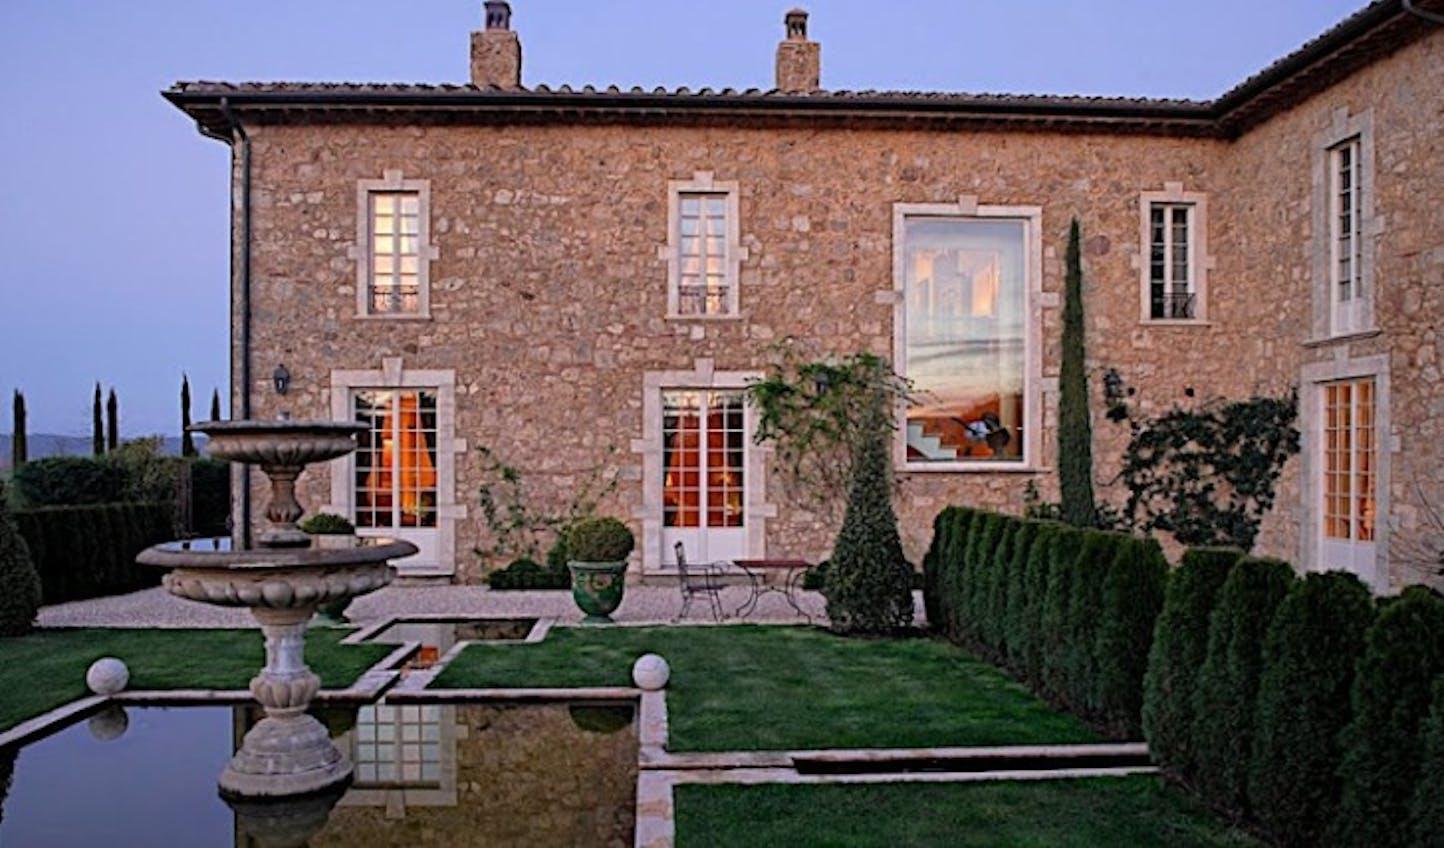 Set in beautiful Tuscan gardens, Borgo Santo Pietro, Italy